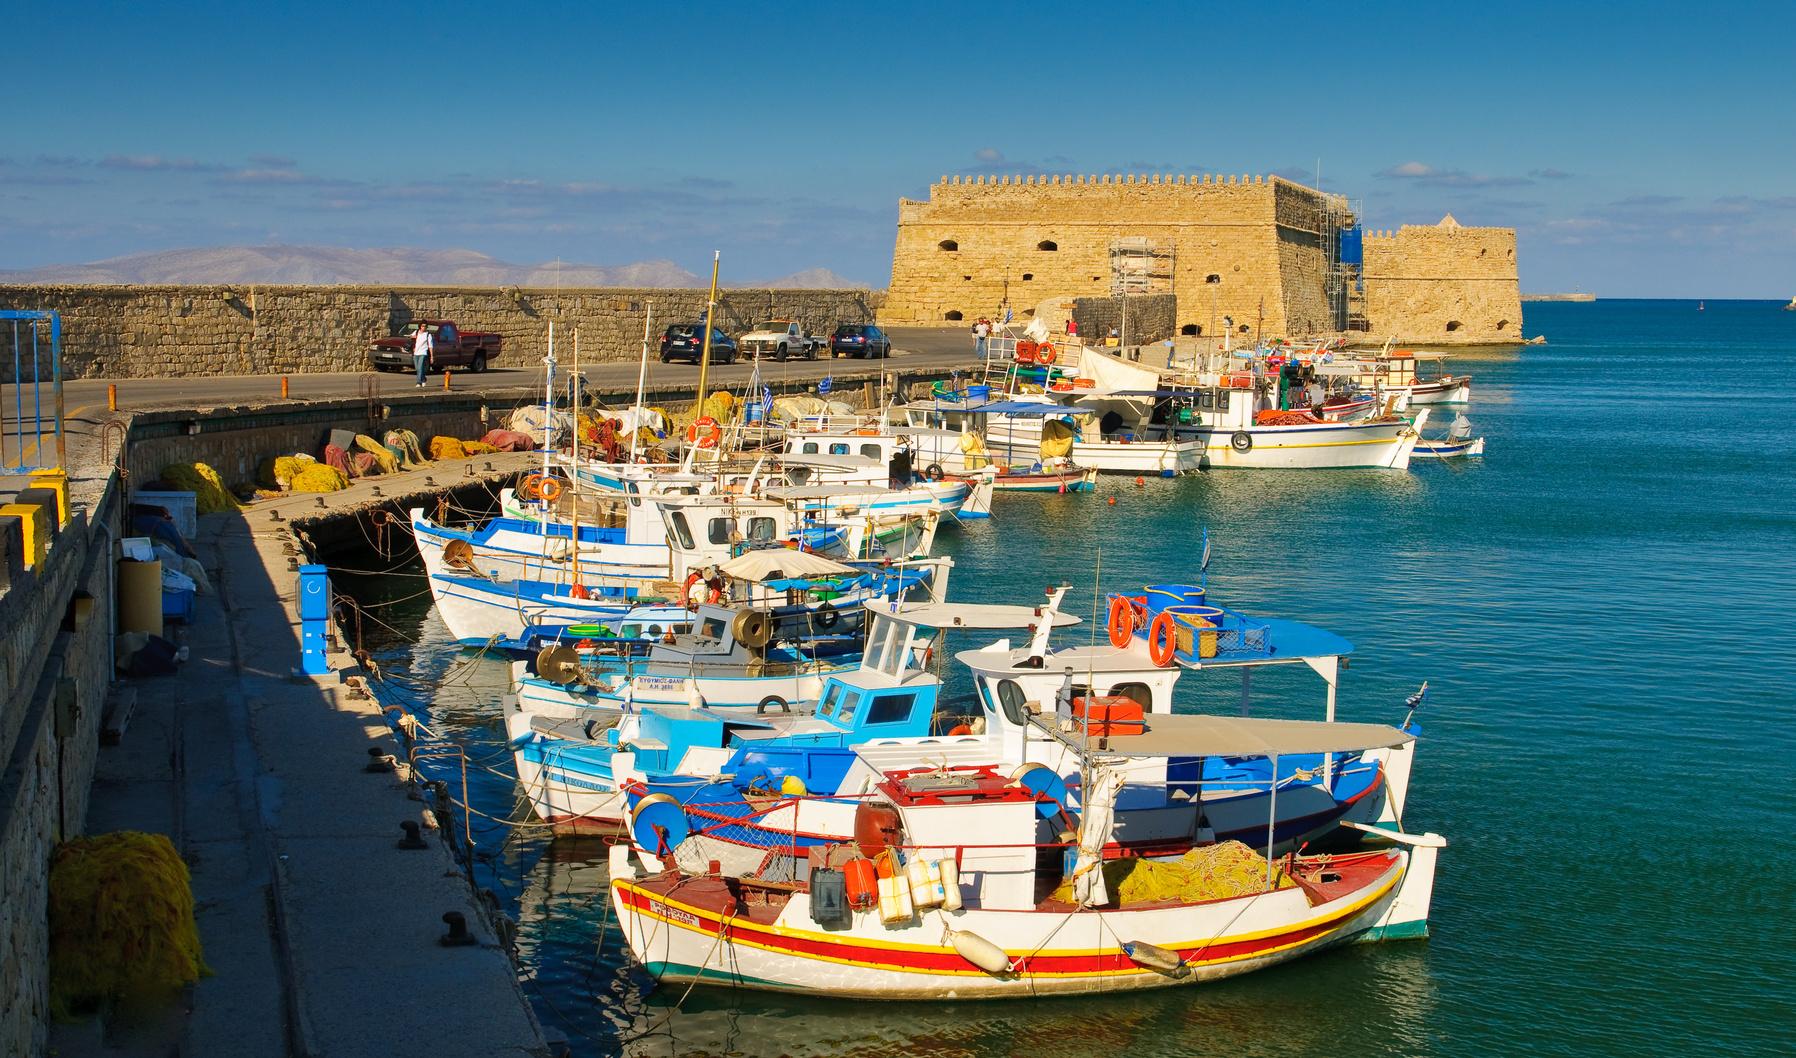 Heraklion Crete Greece: Compare to Greek Islands ... Daily Kos